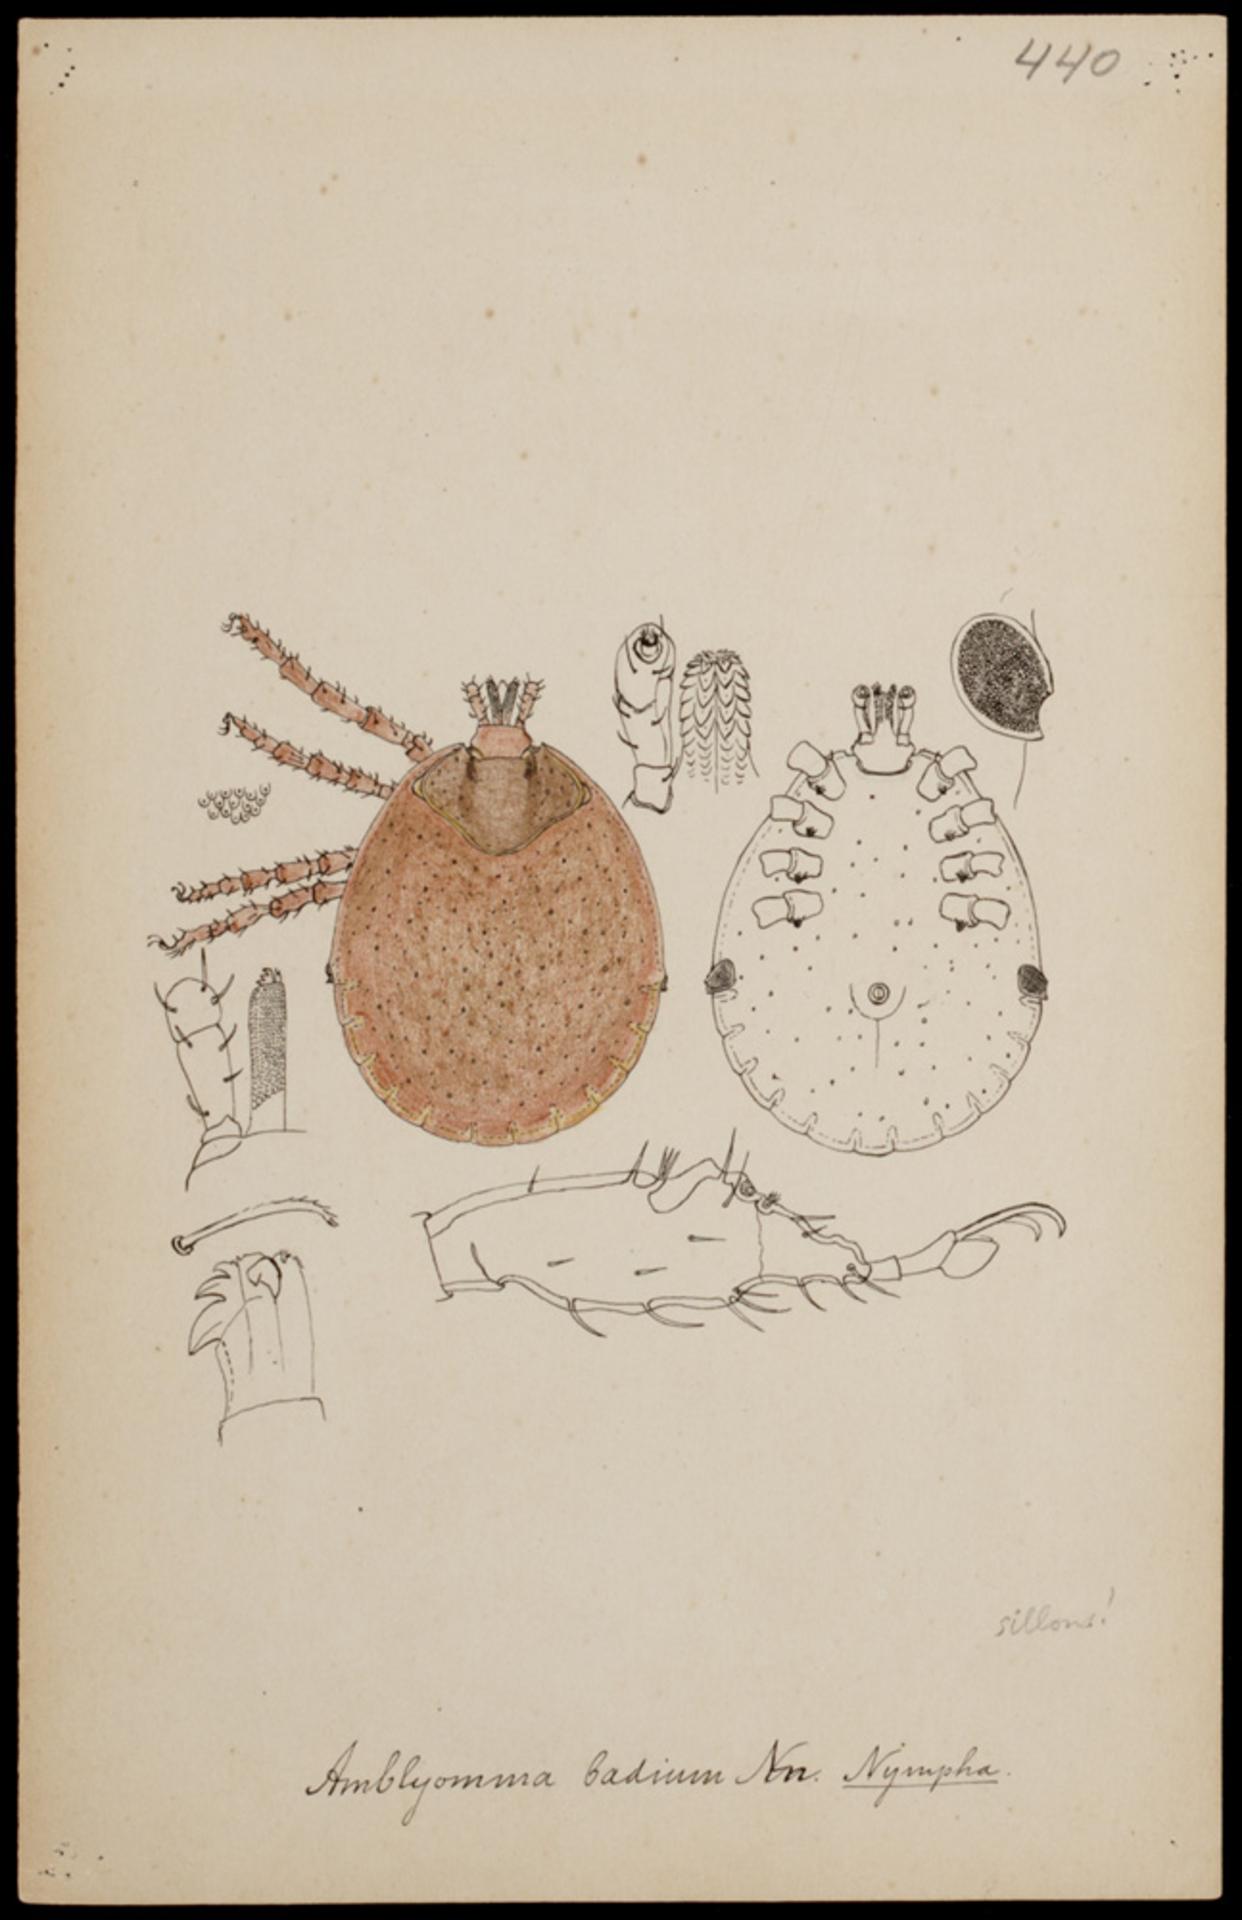 RMNH.ART.1200   Amblyomma badium (Neumann)